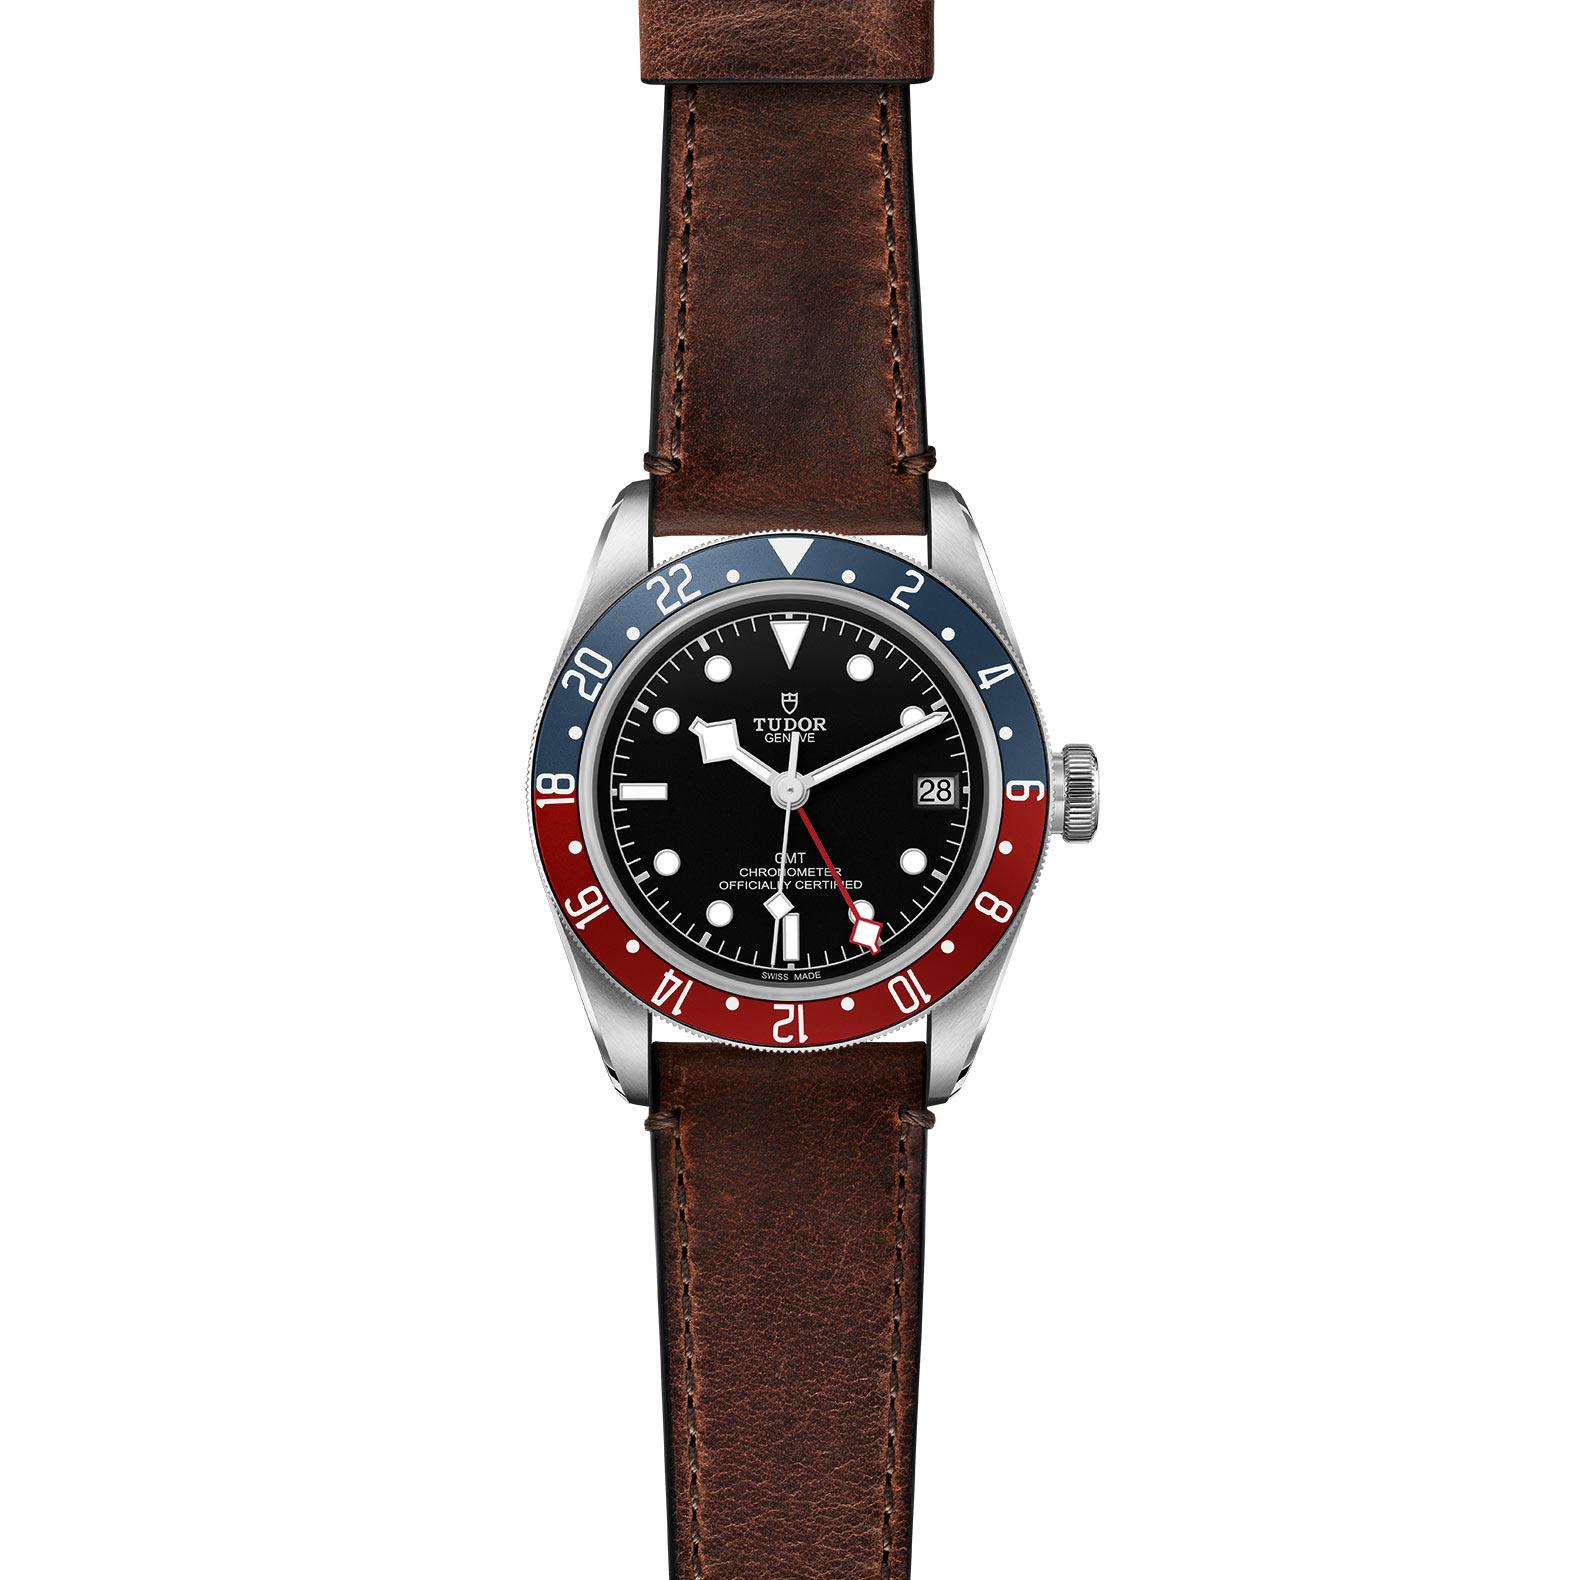 TUDOR Black Bay GMT M79830RB 0002 Frontfacing